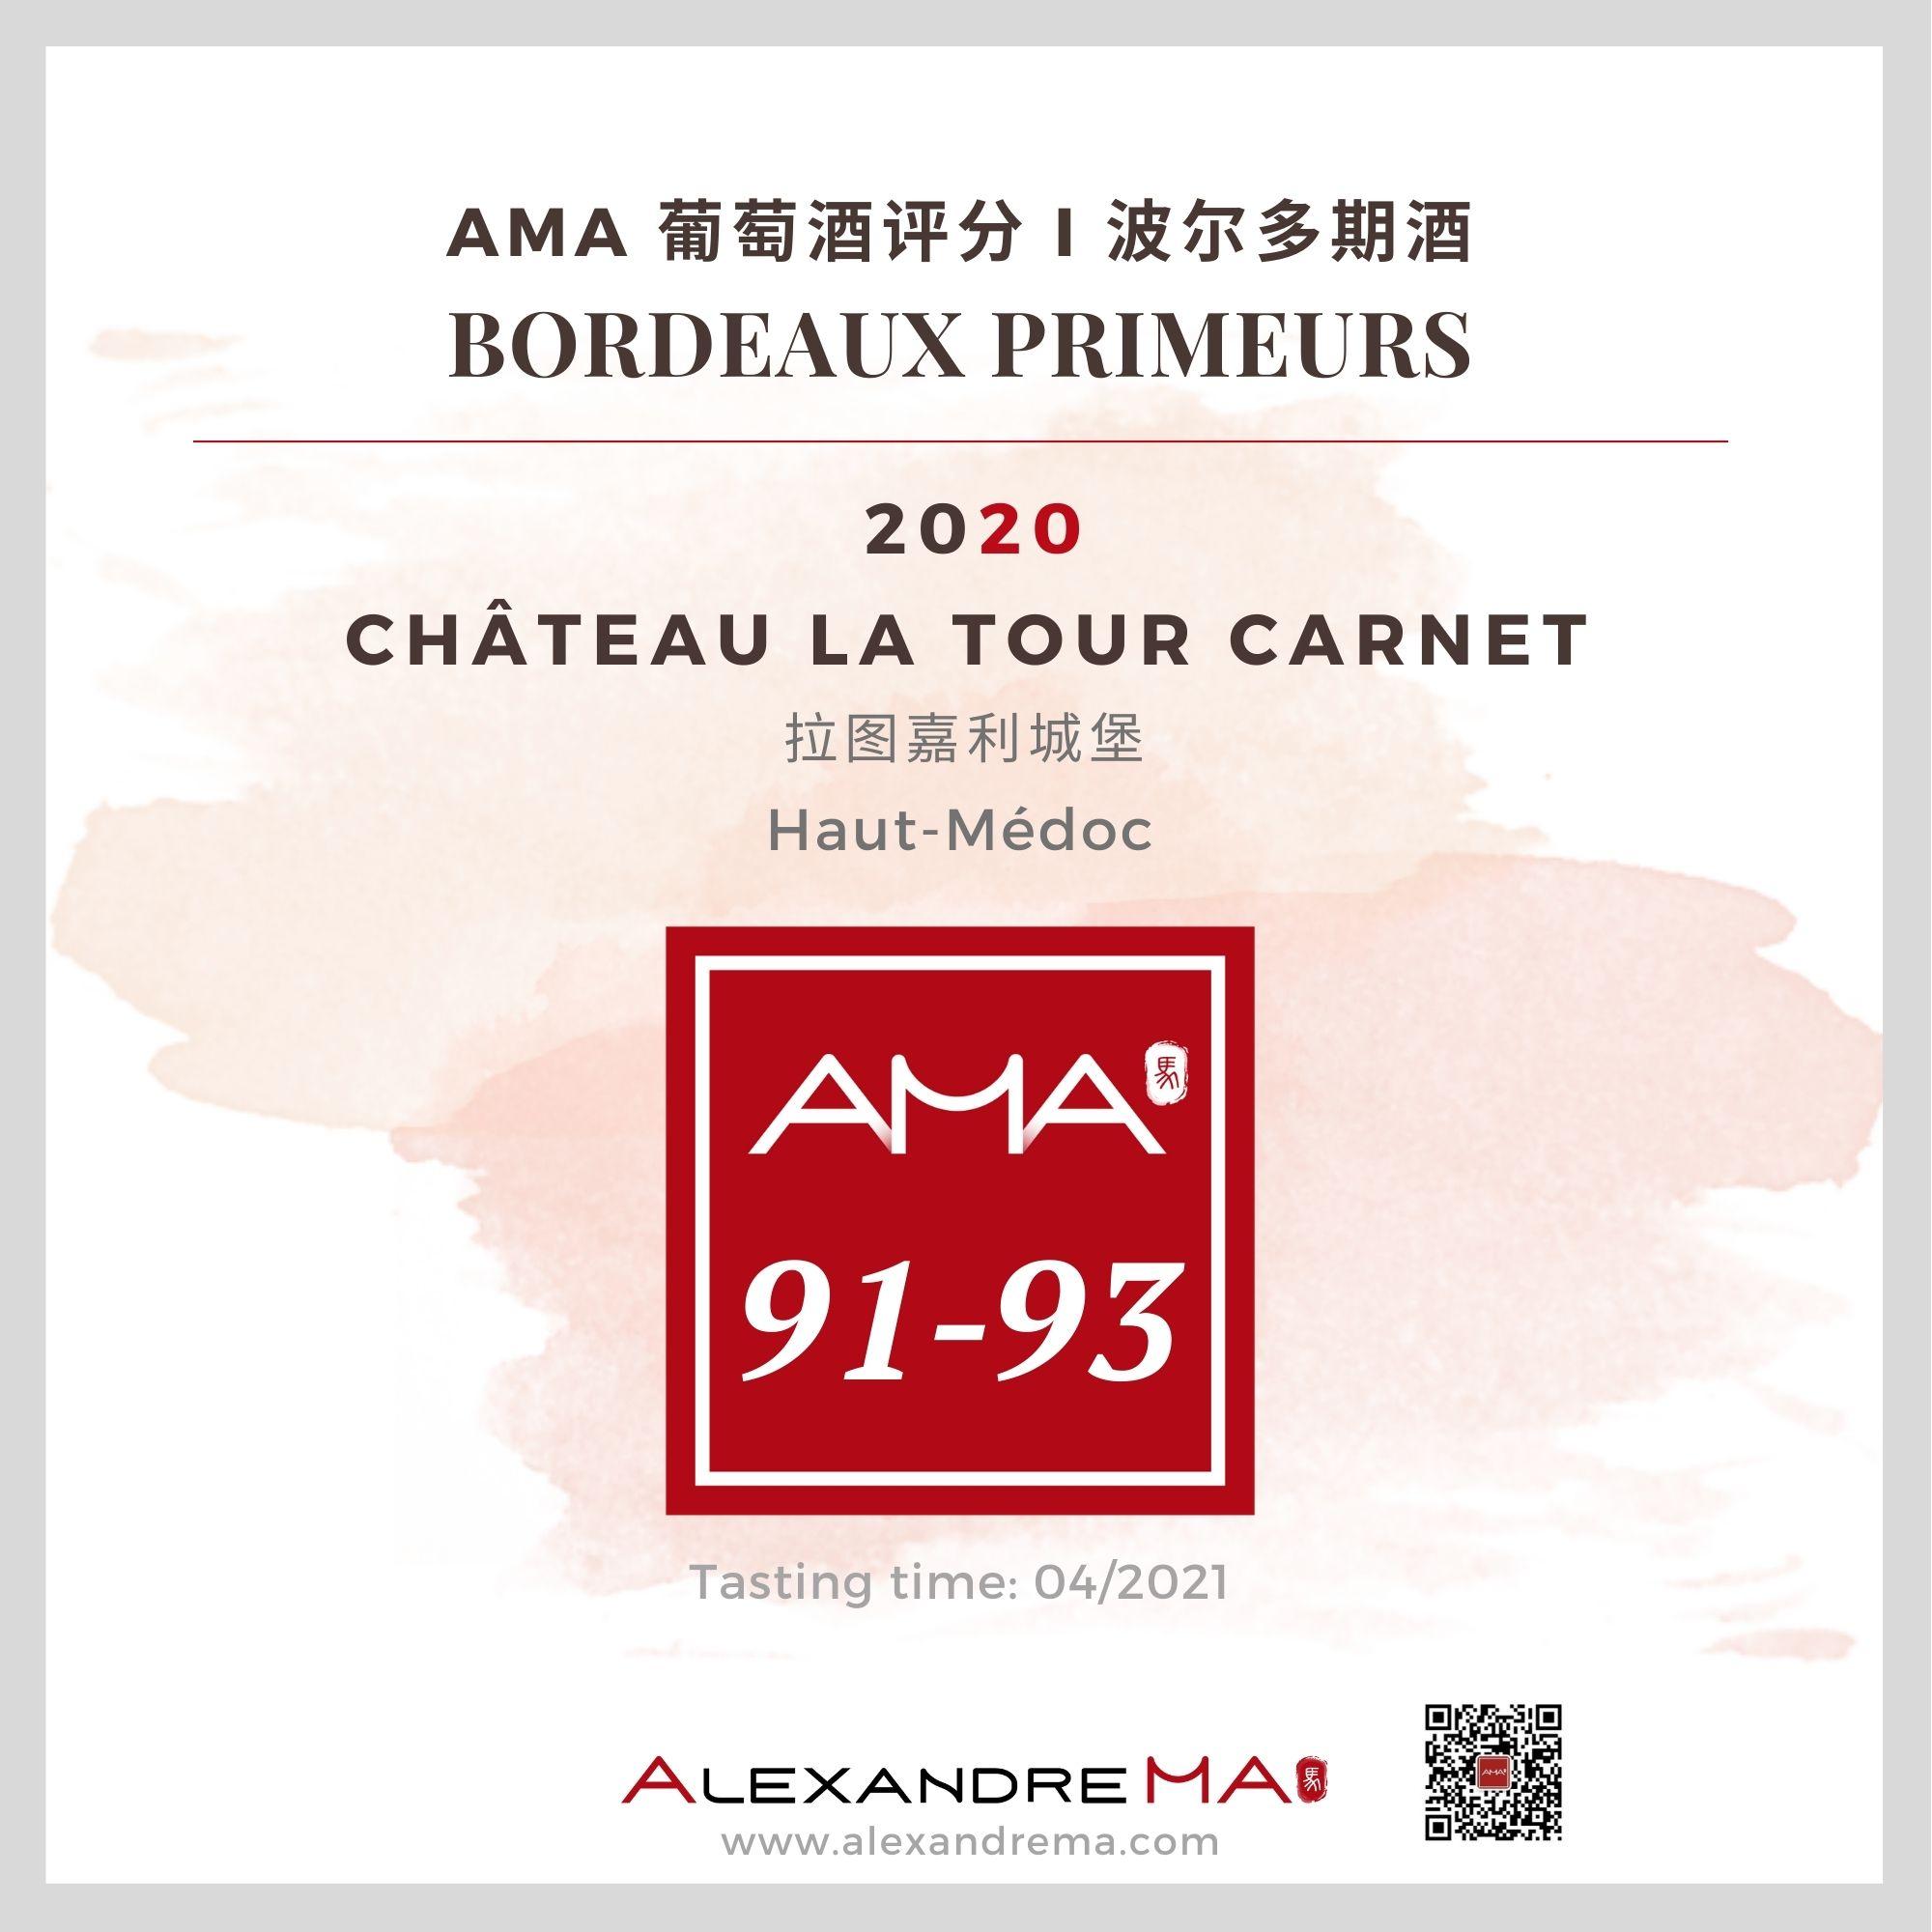 Château La Tour Carnet 2020 拉图嘉利城堡 - Alexandre Ma